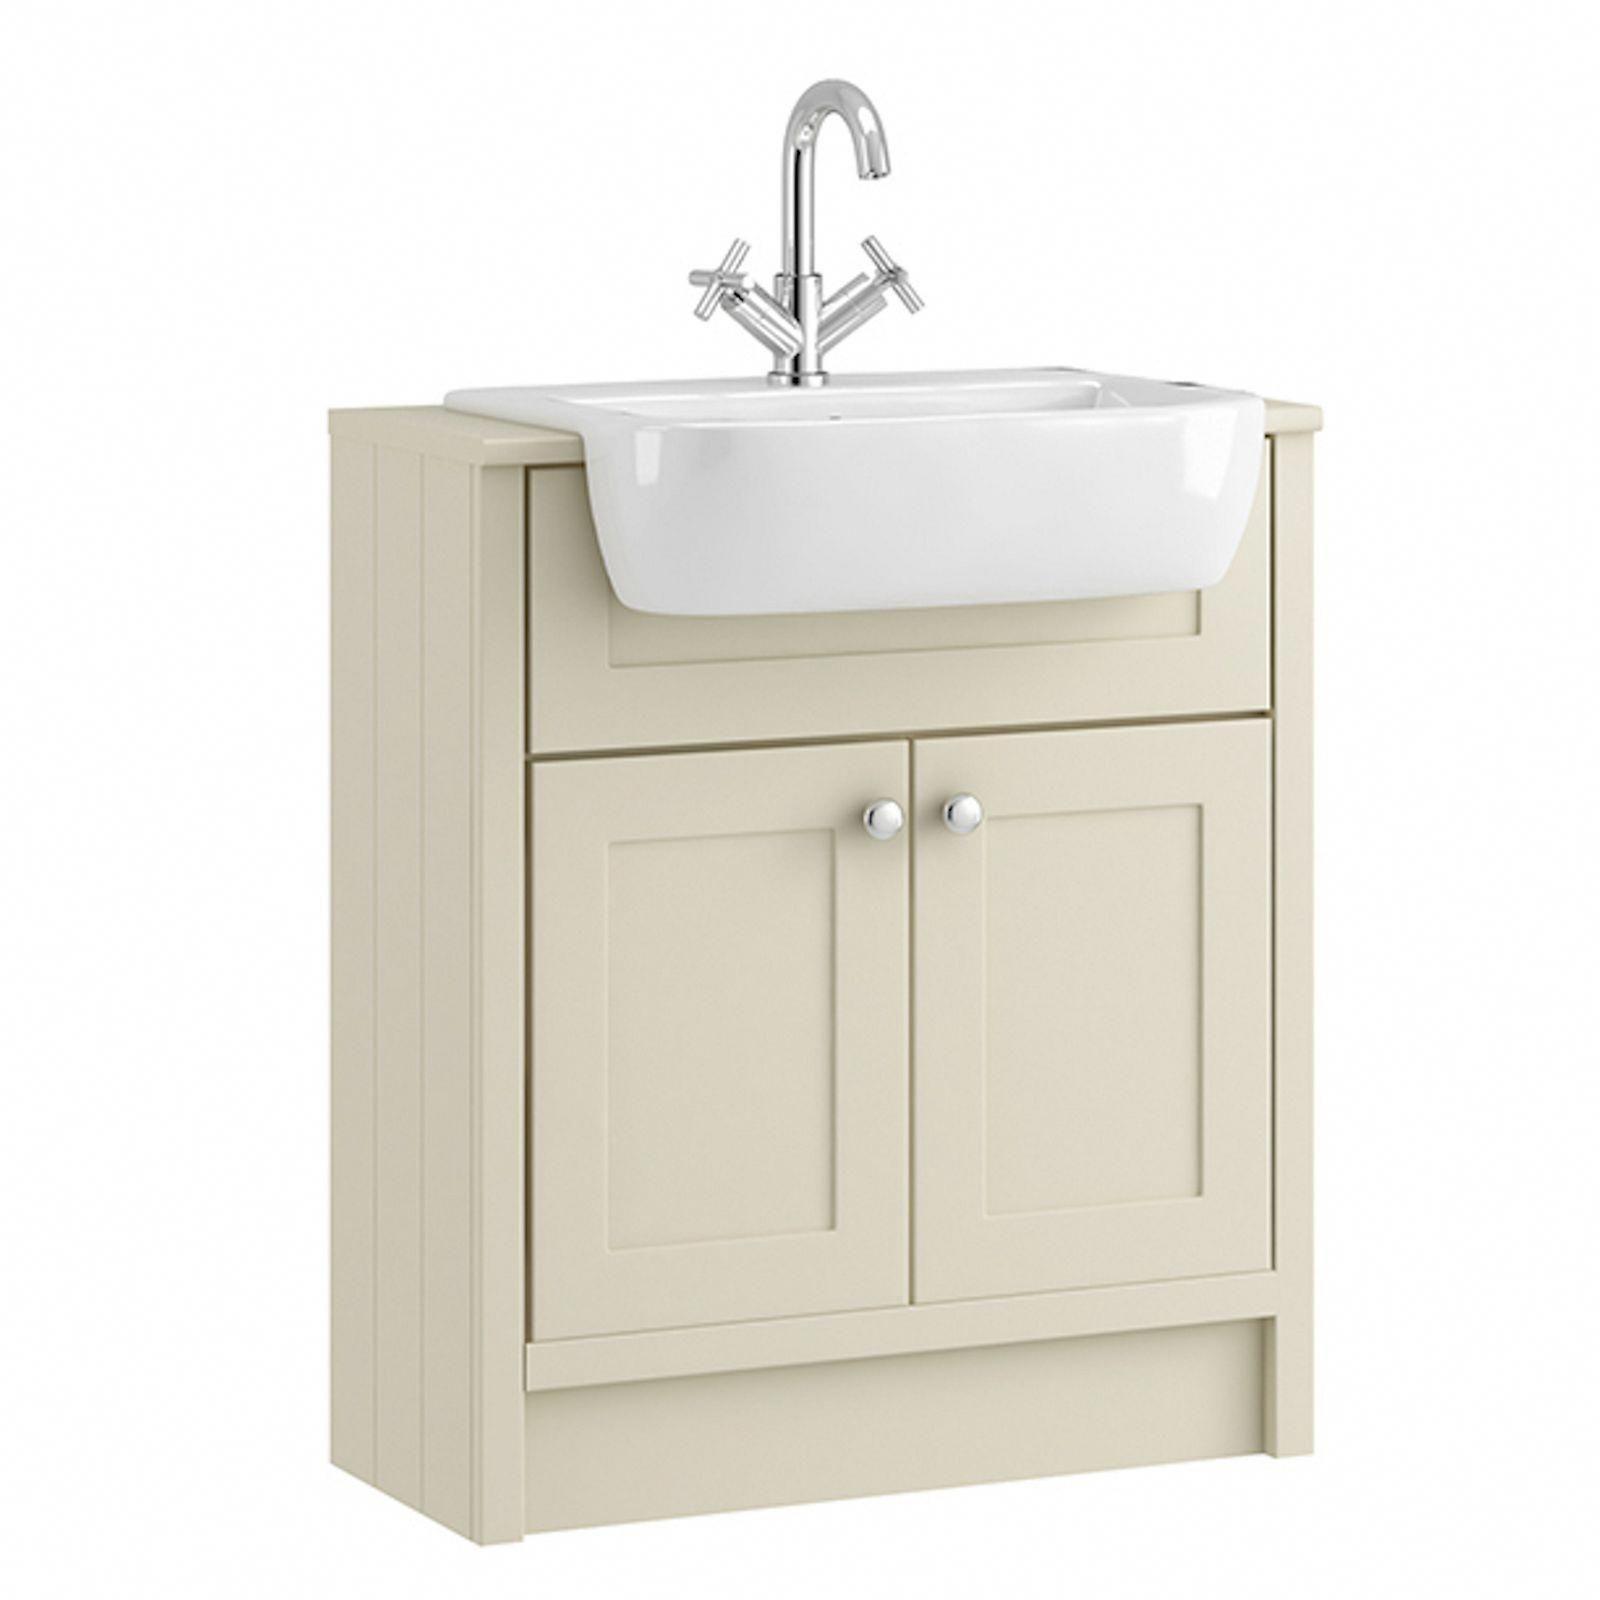 Plumbing Books Village Plumbing Queens Village Ny Plumbing Yorkshire Plumbing A Bathroom Is It Hard Total In 2020 Bathroom Vanity Units Bathroom Vanity Vanity